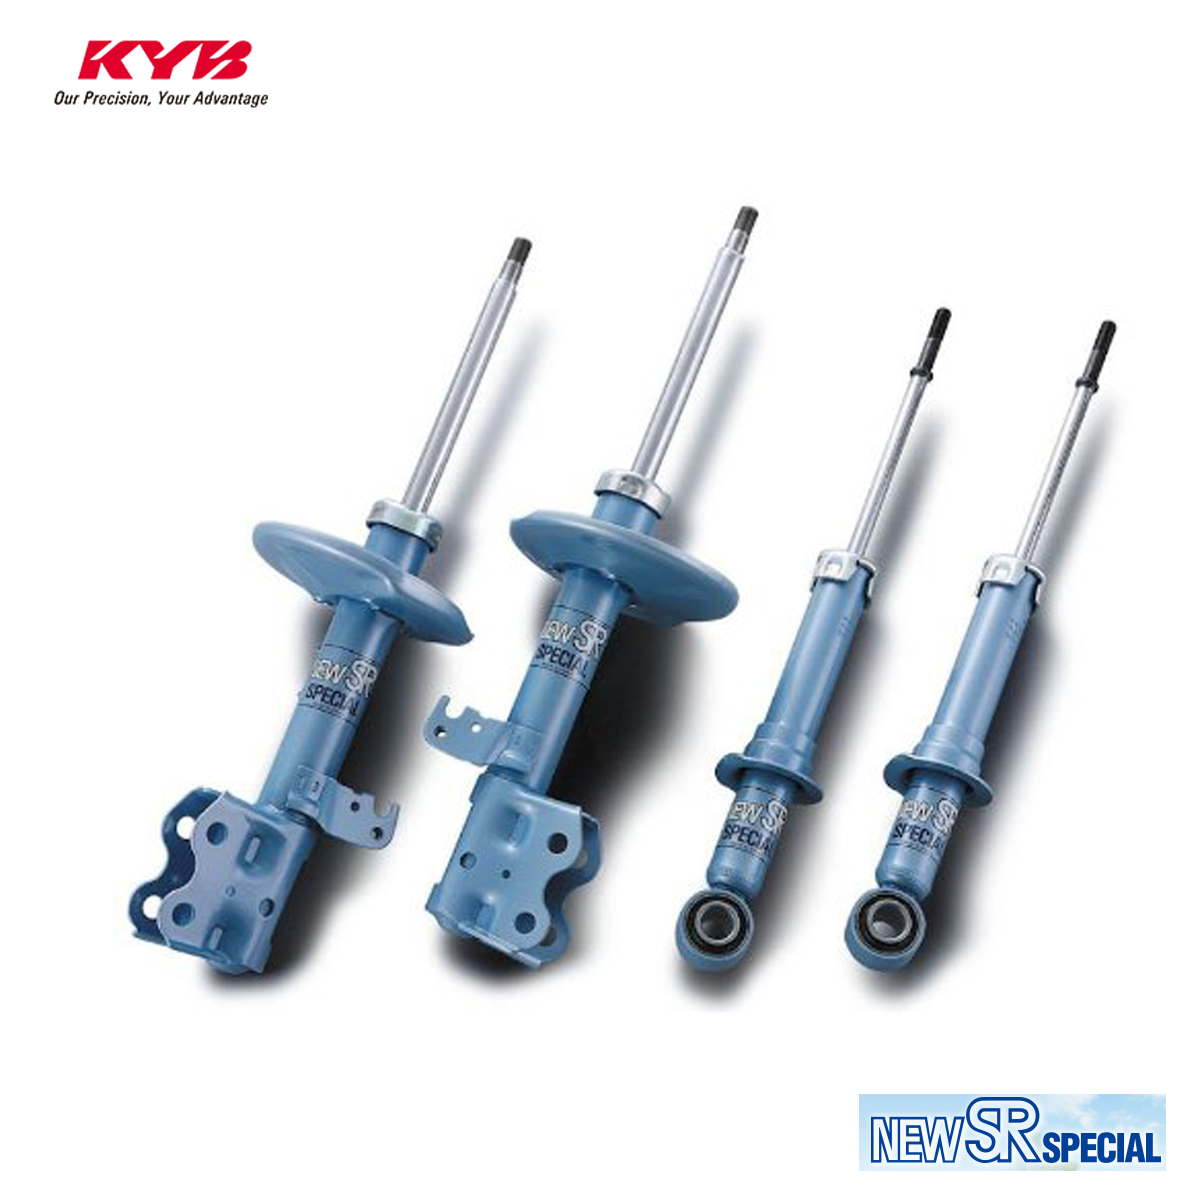 KYB カヤバ ビスタ SV32 ショックアブソーバー フロント用 1本 NEW SR SPECIAL NSC4106 配送先条件有り